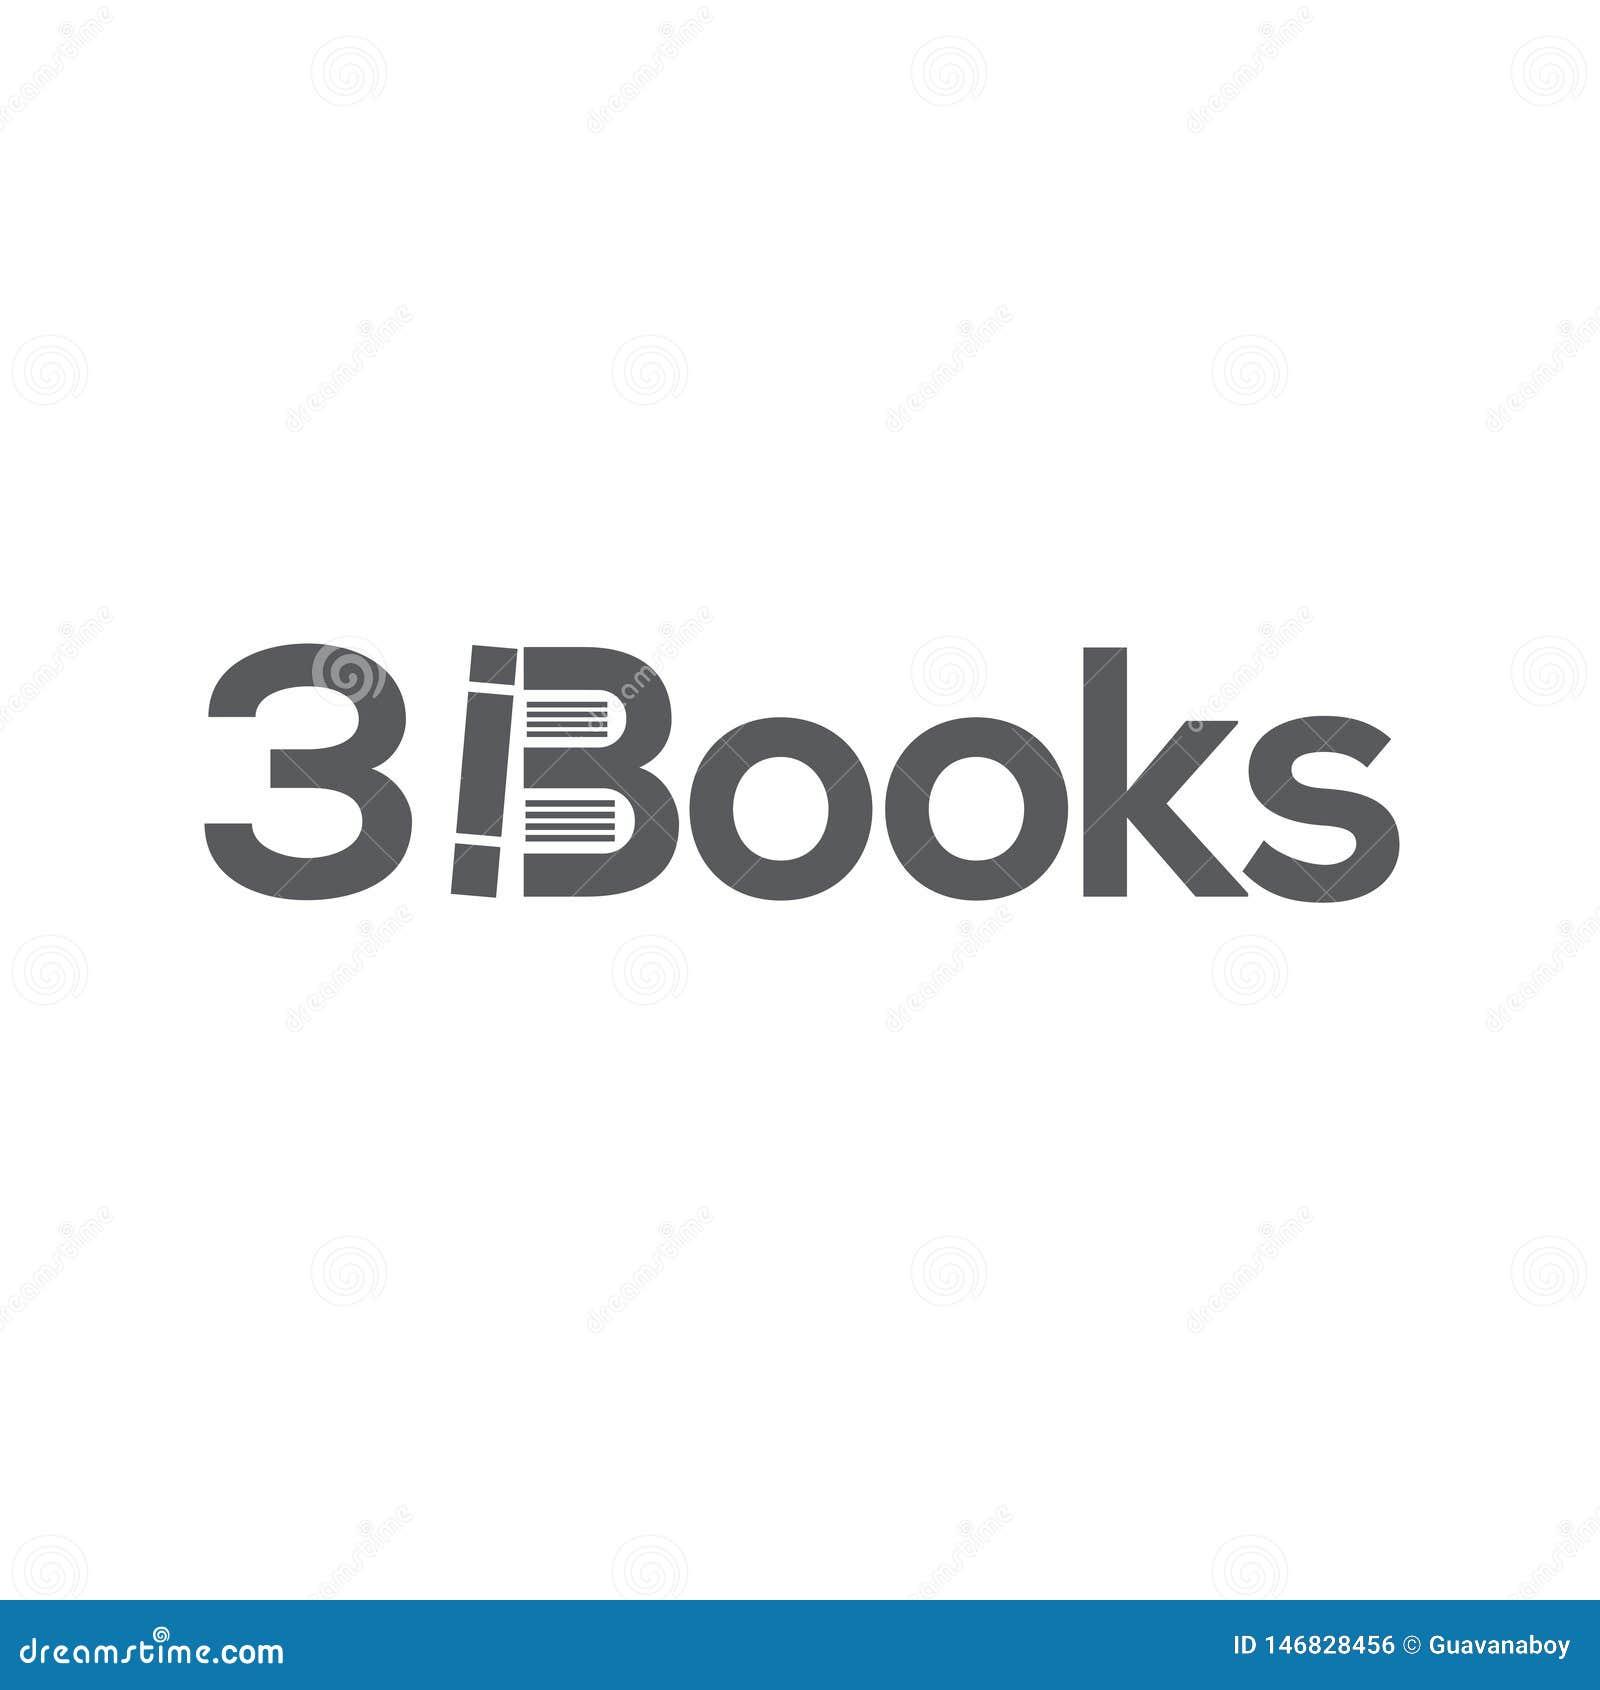 Books logo template